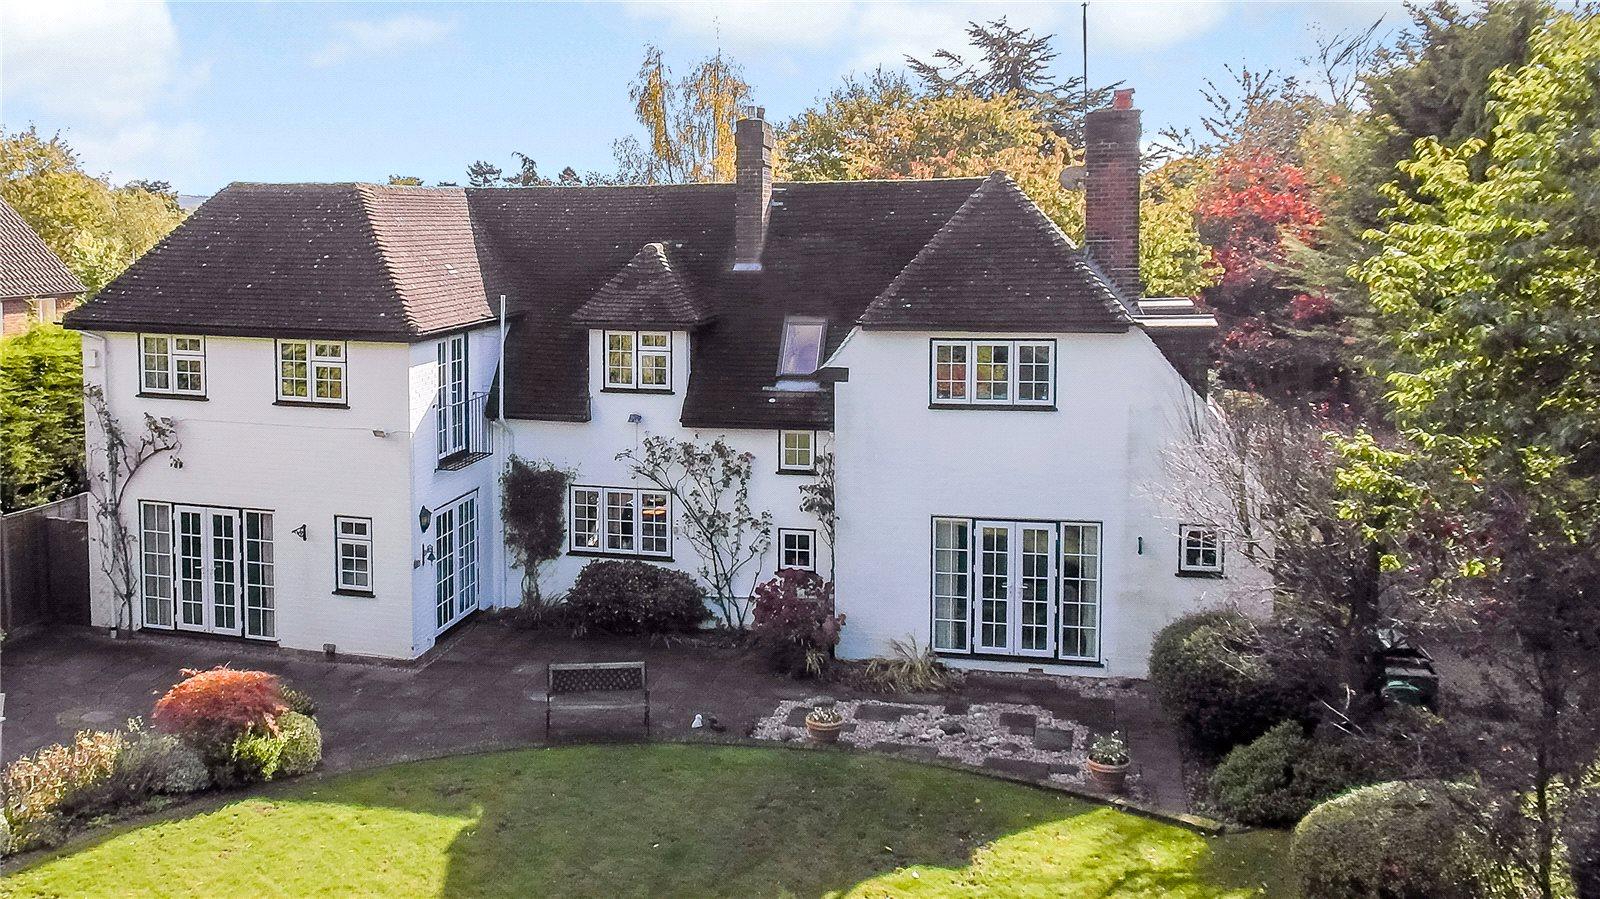 Maison unifamiliale pour l Vente à Stewart Road, Harpenden, Hertfordshire, AL5 Harpenden, Angleterre